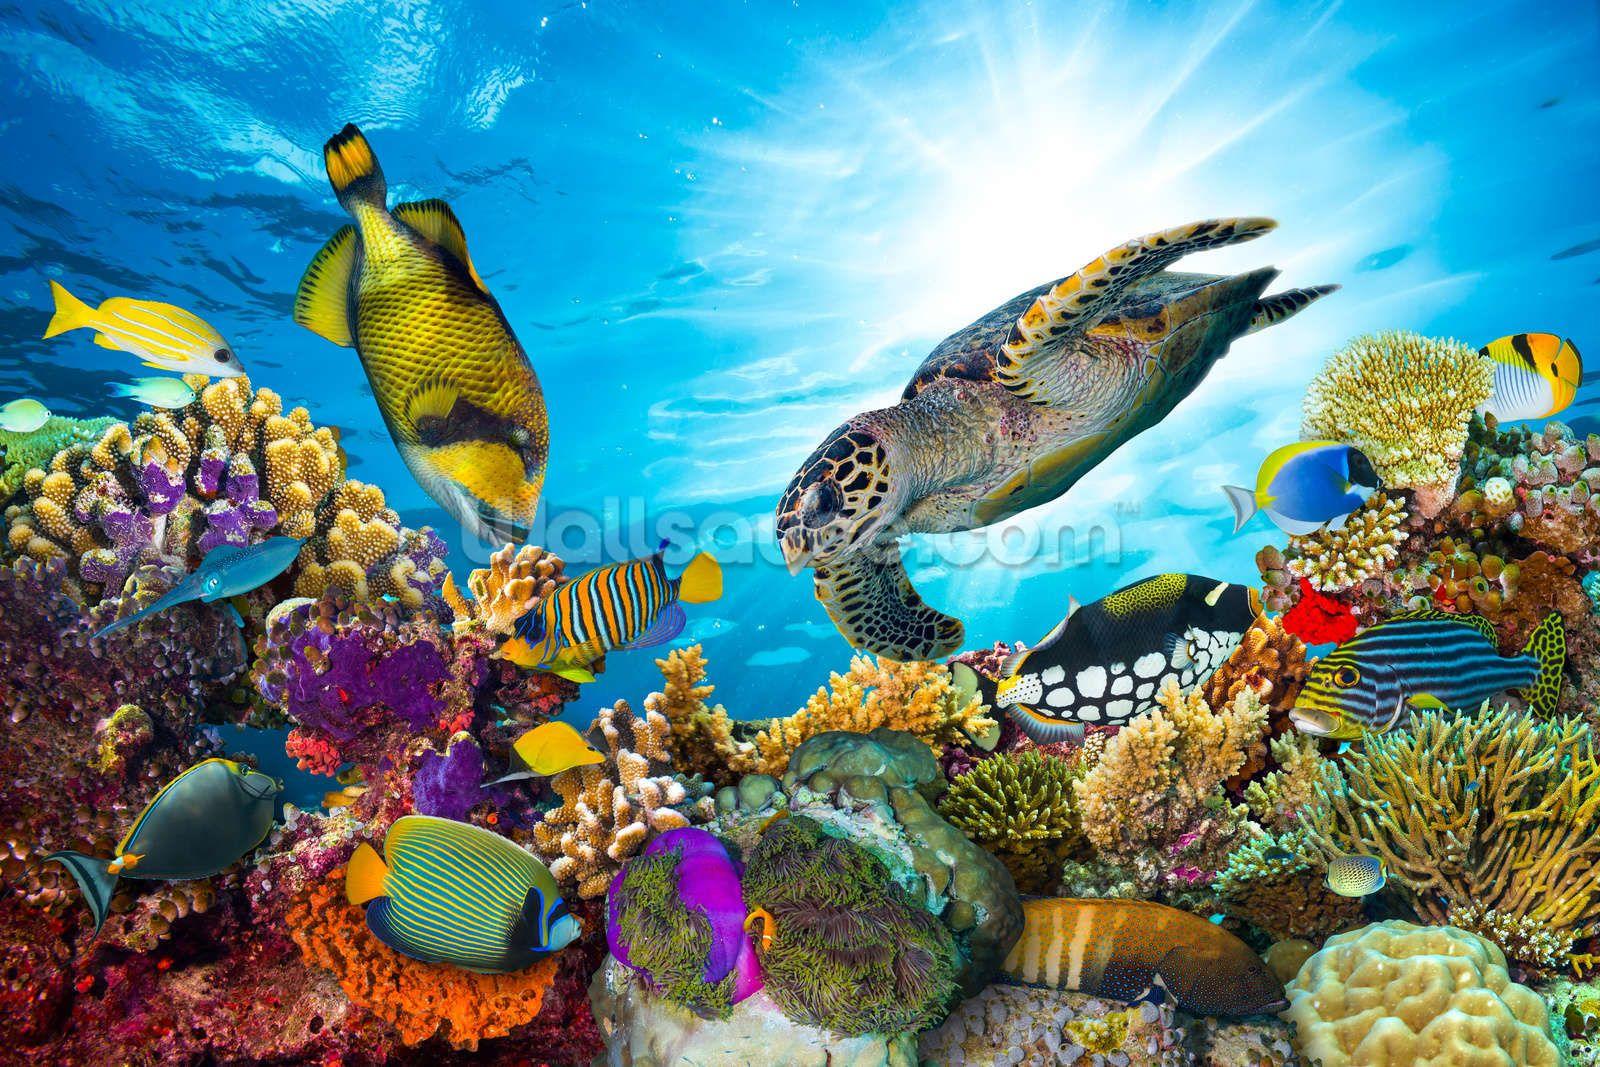 Coral Reef Diversity Wildlife Day Tropical Fish Sea Life Art